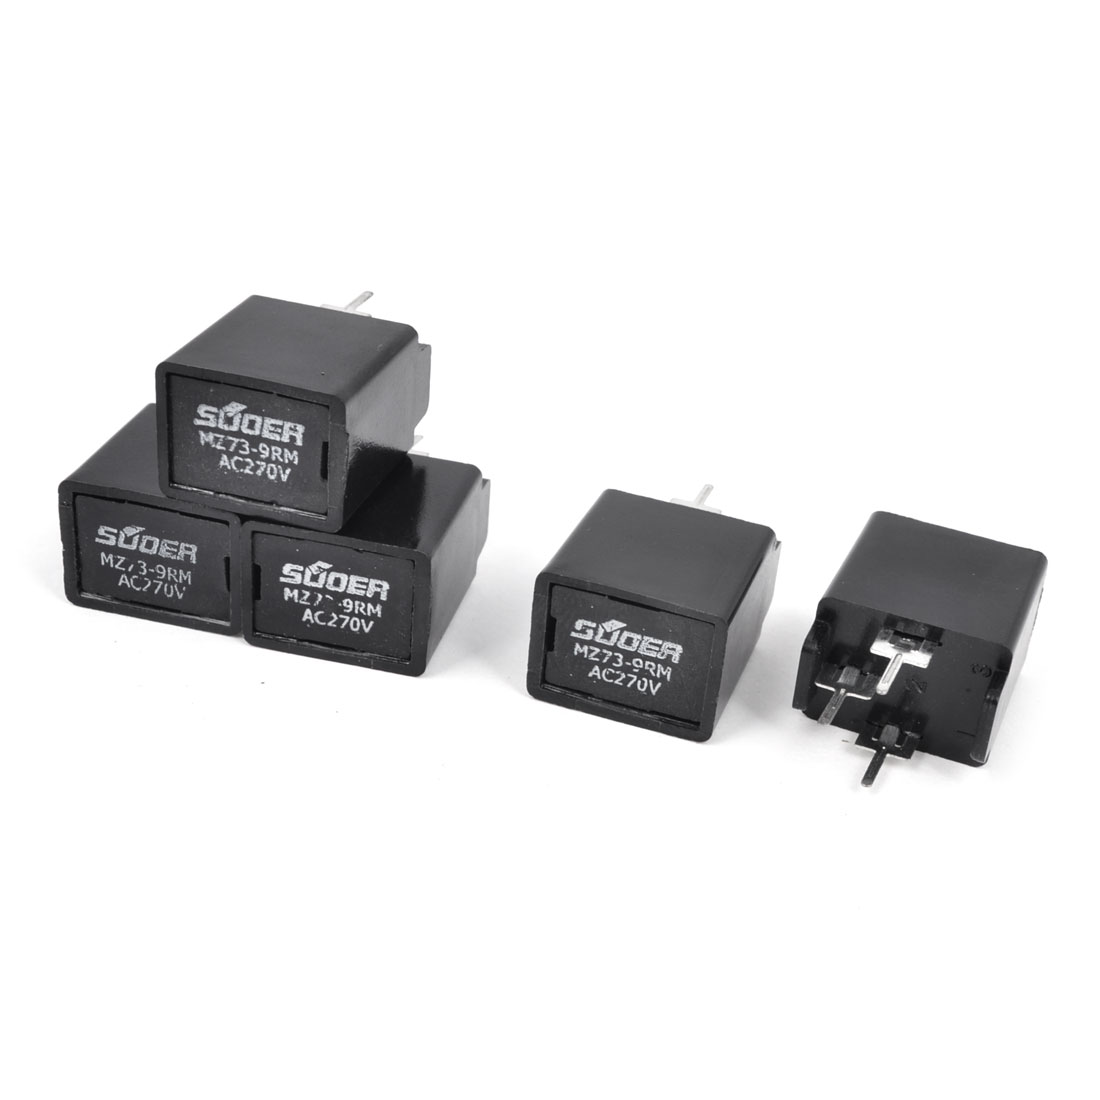 5 Pieces MZ73-9RM 9 Ohm 270V 3 Terminals PTC Degaussing Resistors for Color TV